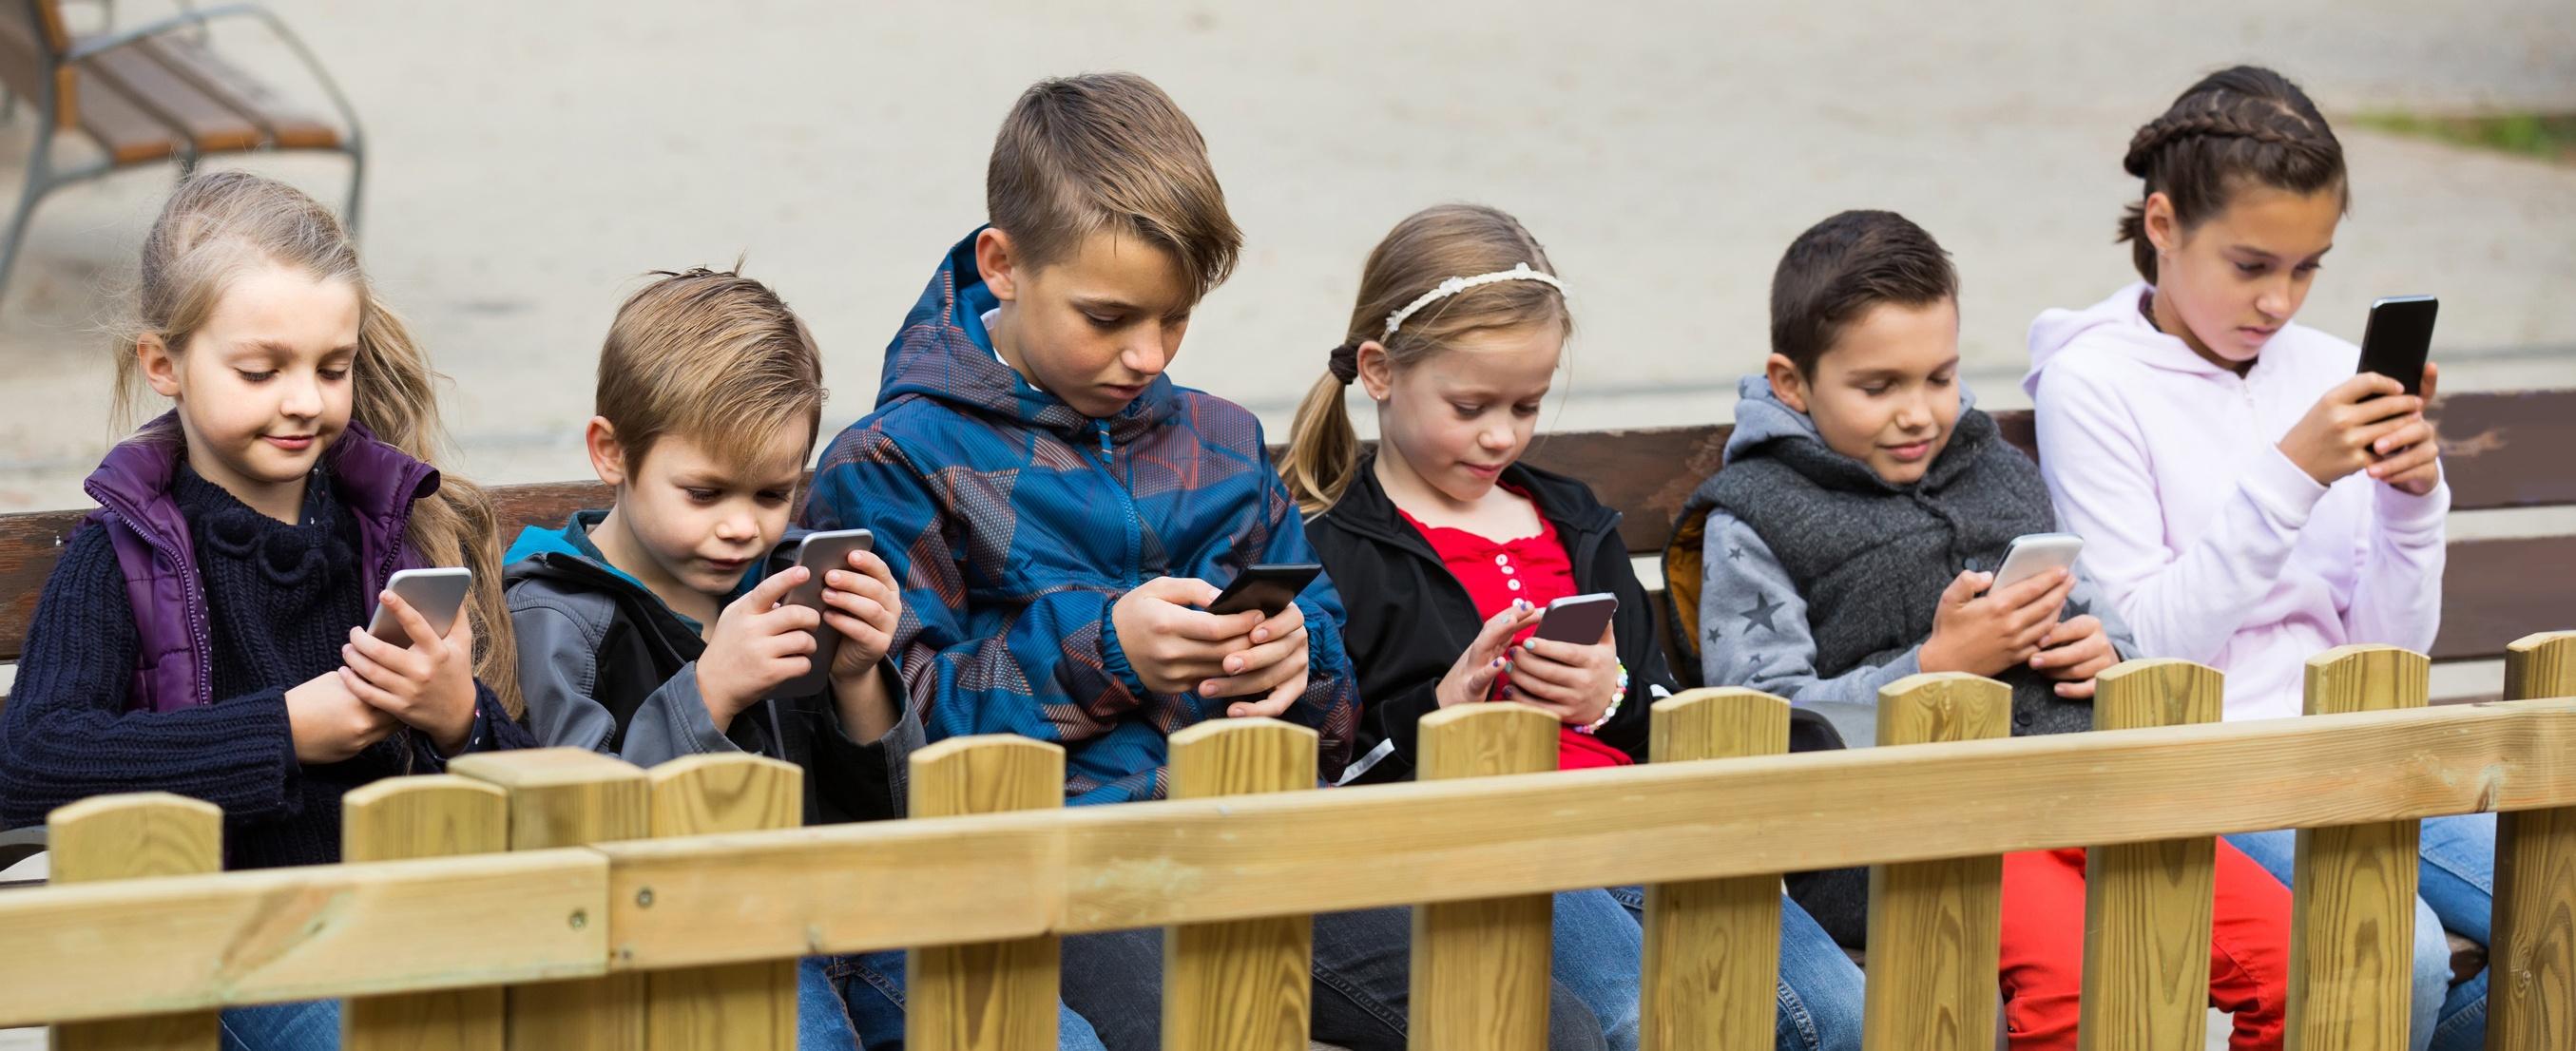 Social Media Is Social Currency for Teens